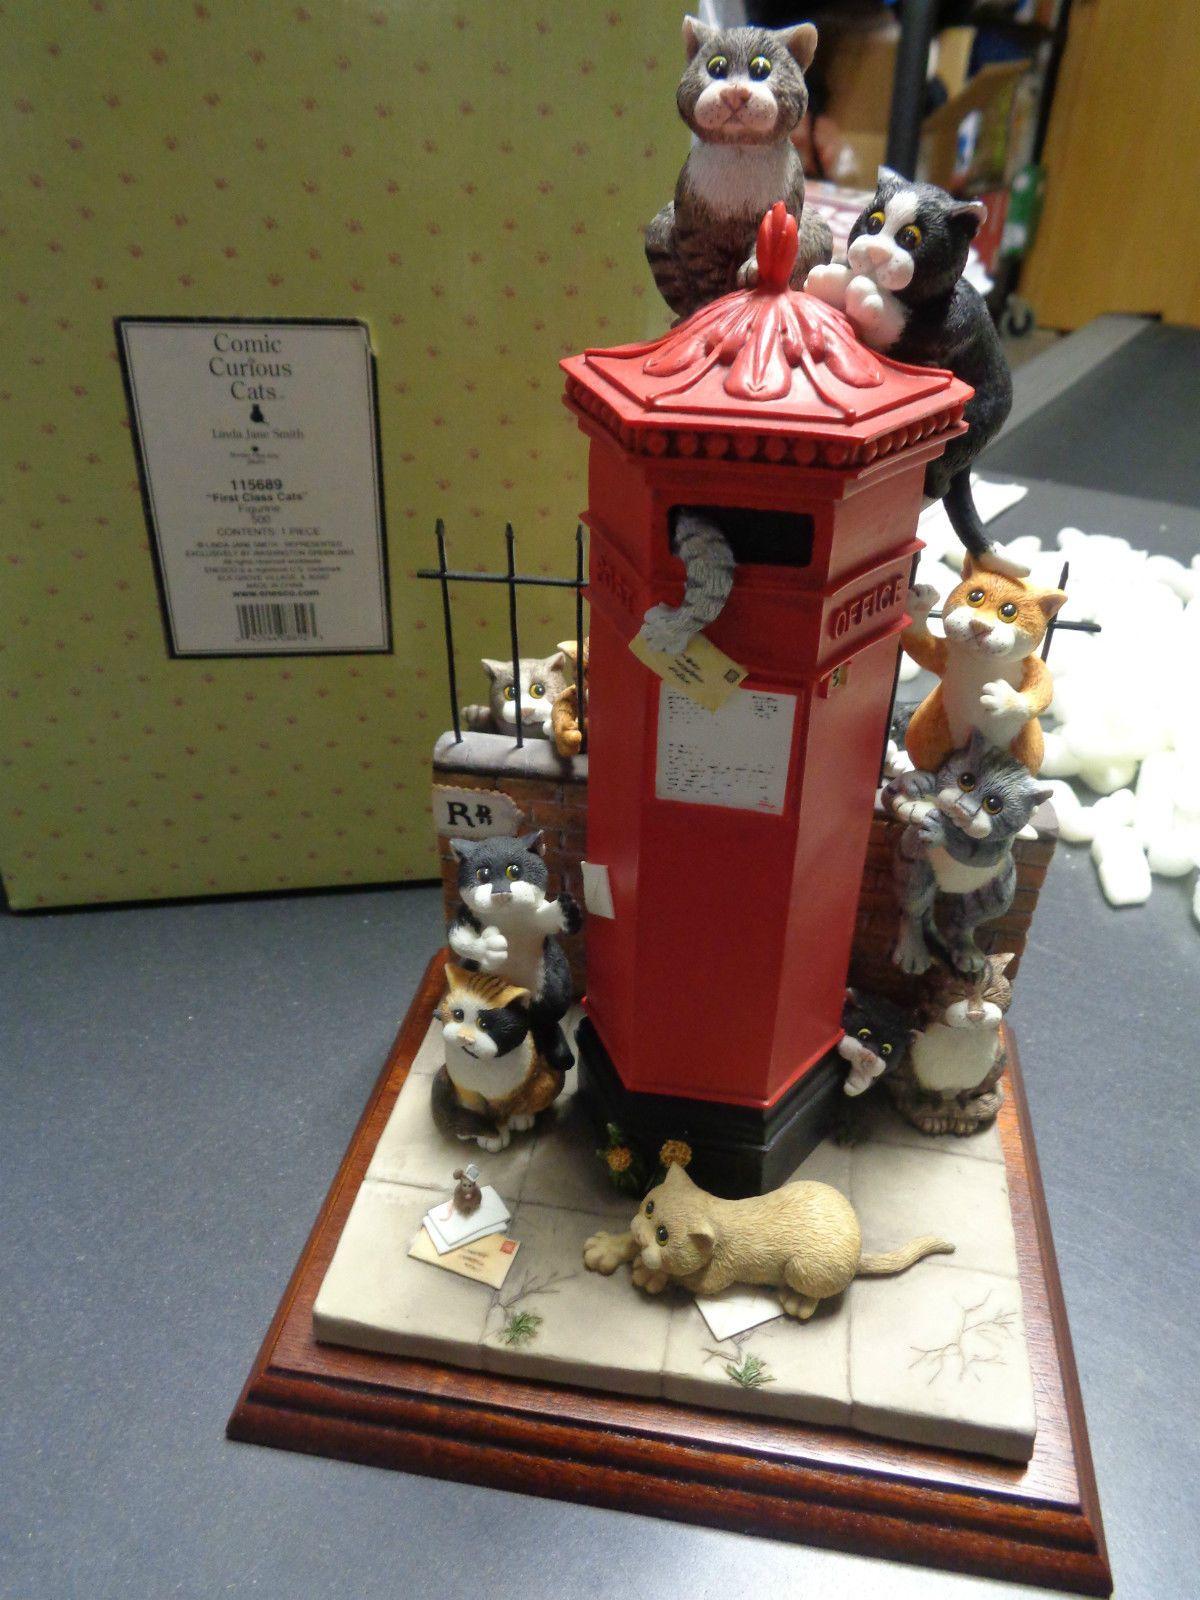 Border Fine Arts Comic & Curious Cats First Class Mailbox